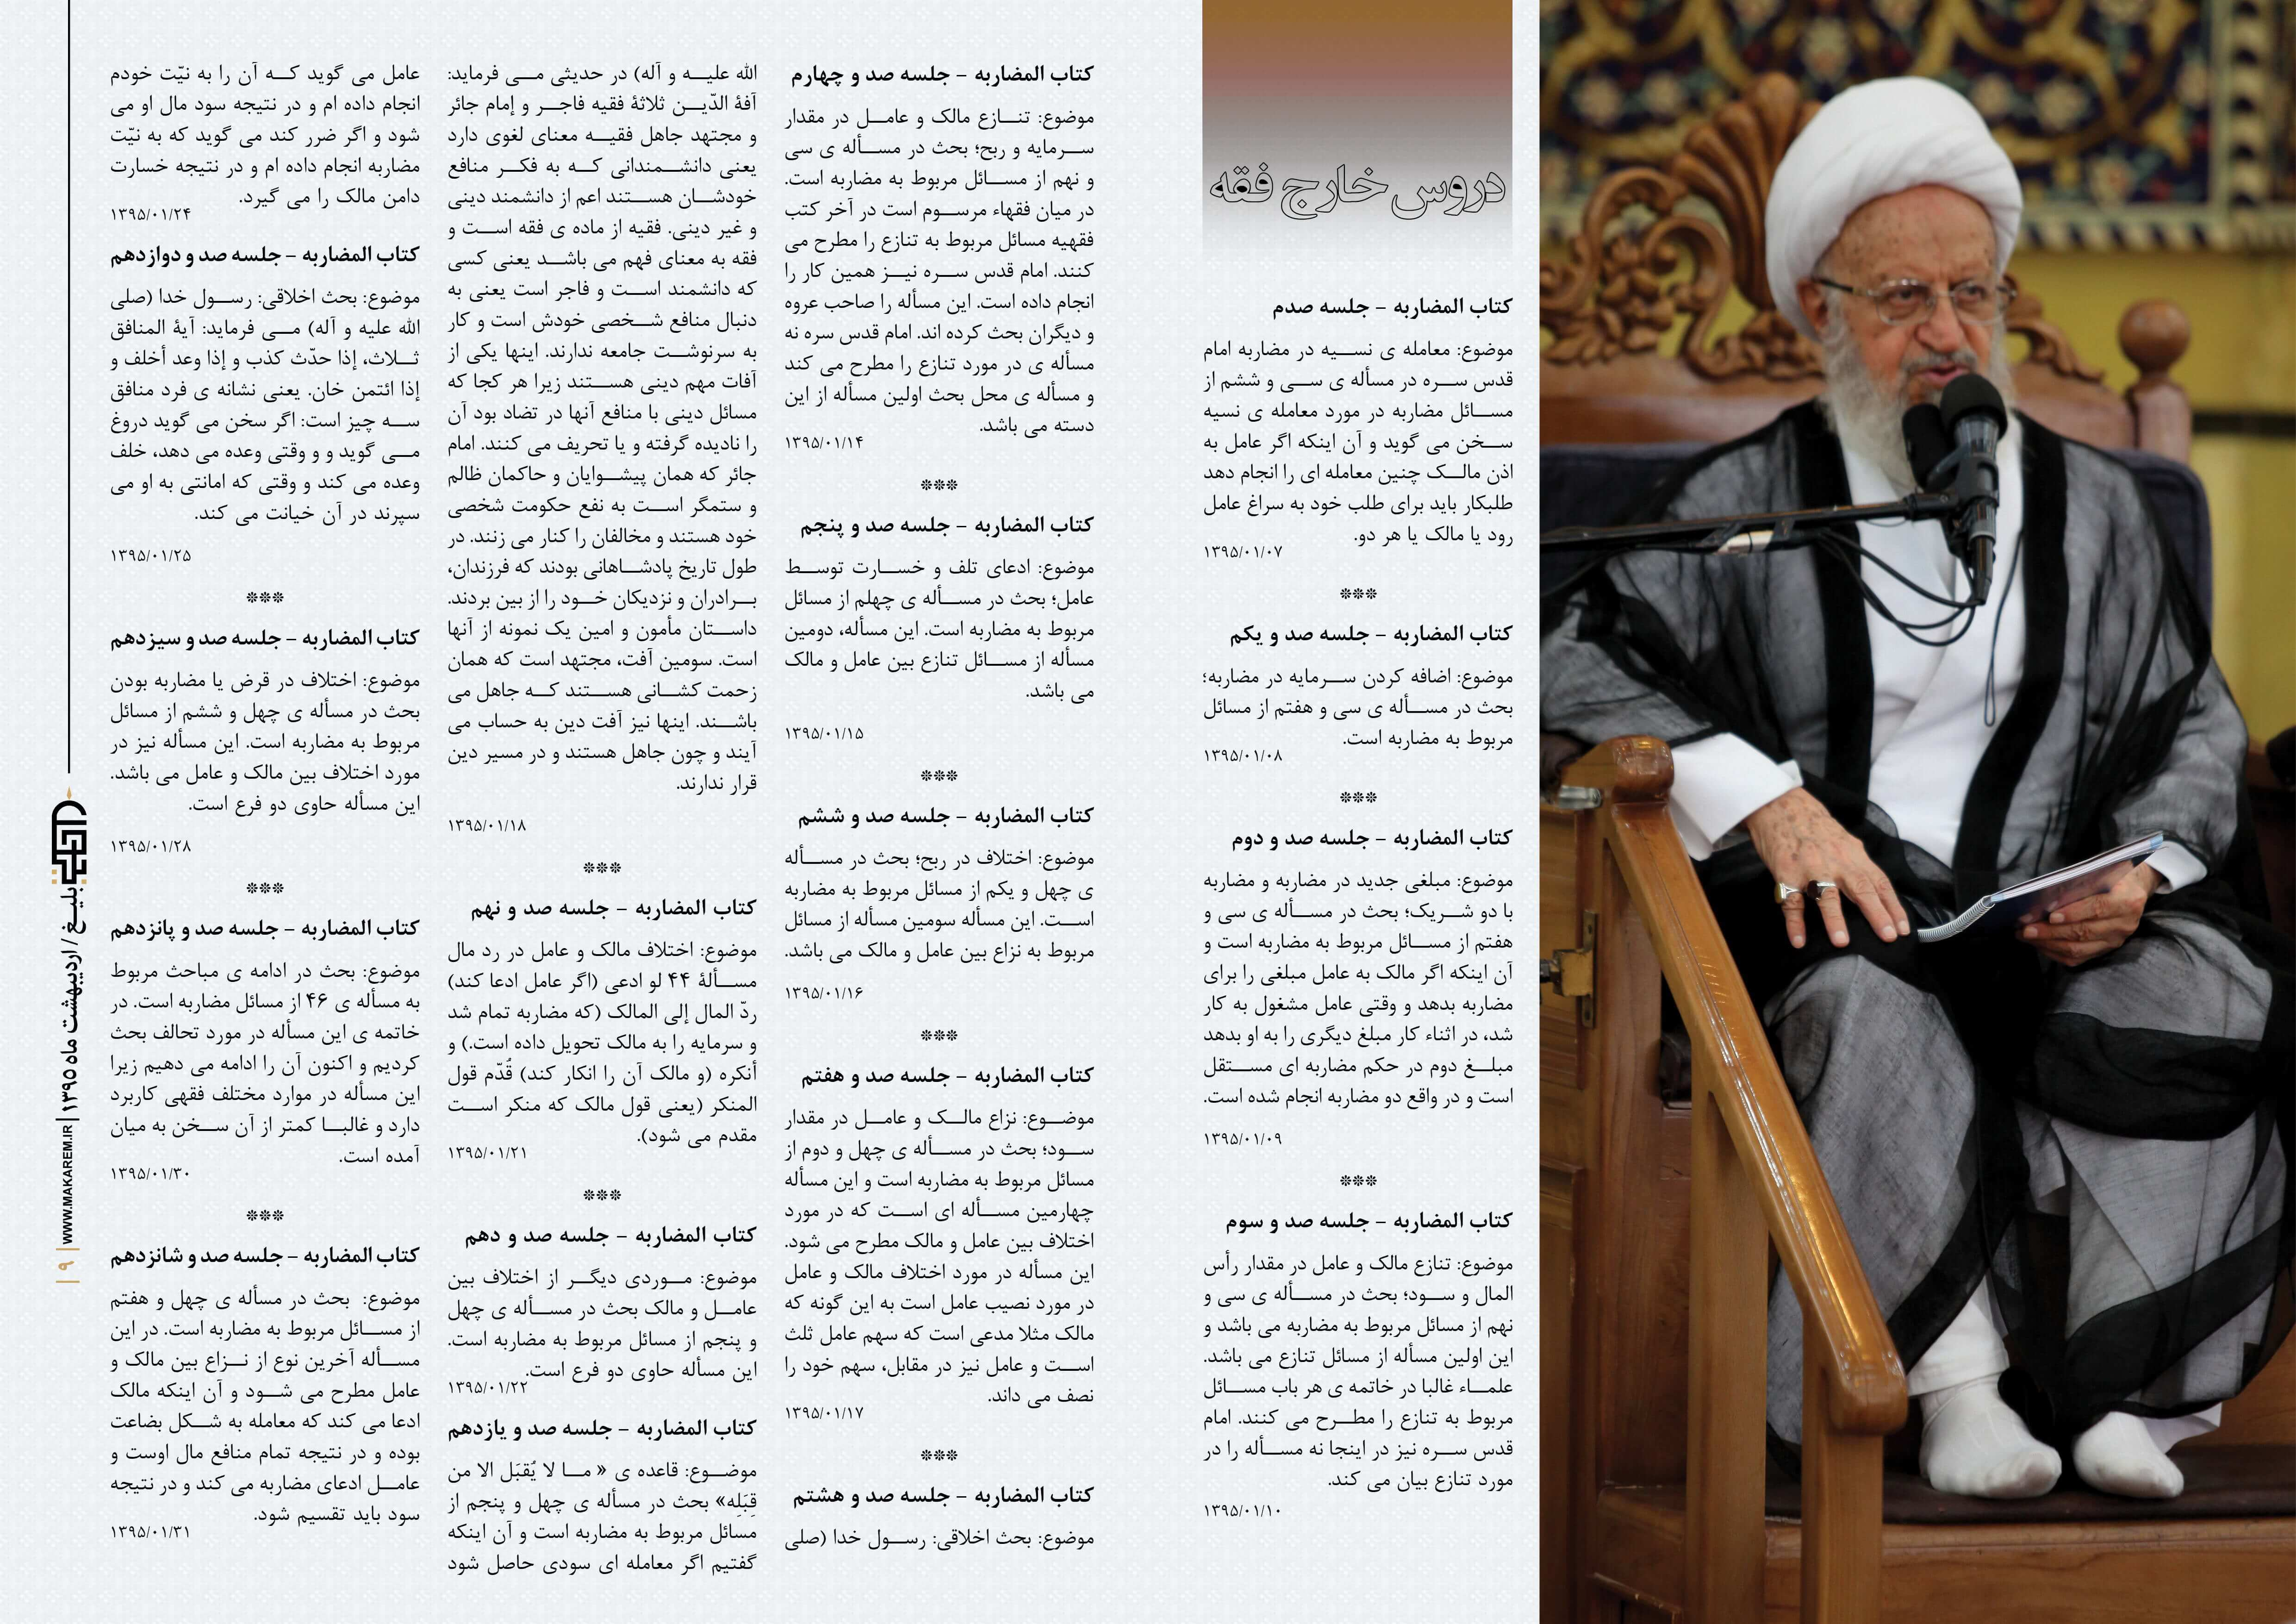 05-مدرسه الامام امیر المومنین (ع)